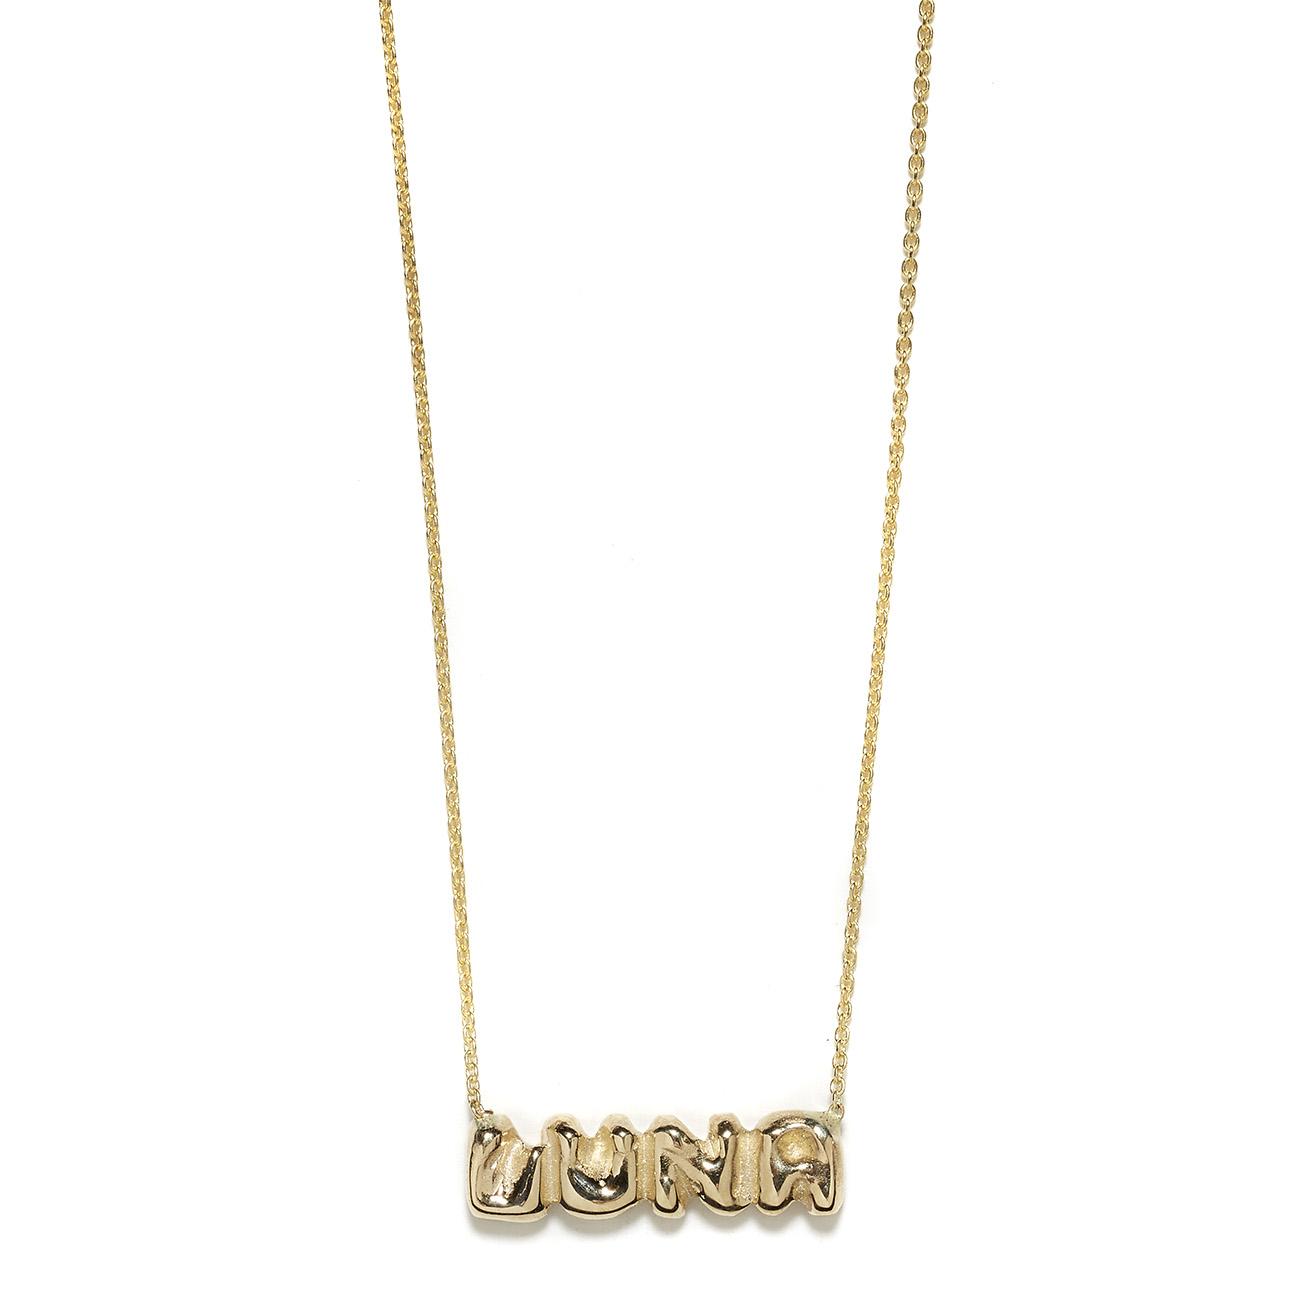 Elisa Solomon - Yellow Gold Name Necklace